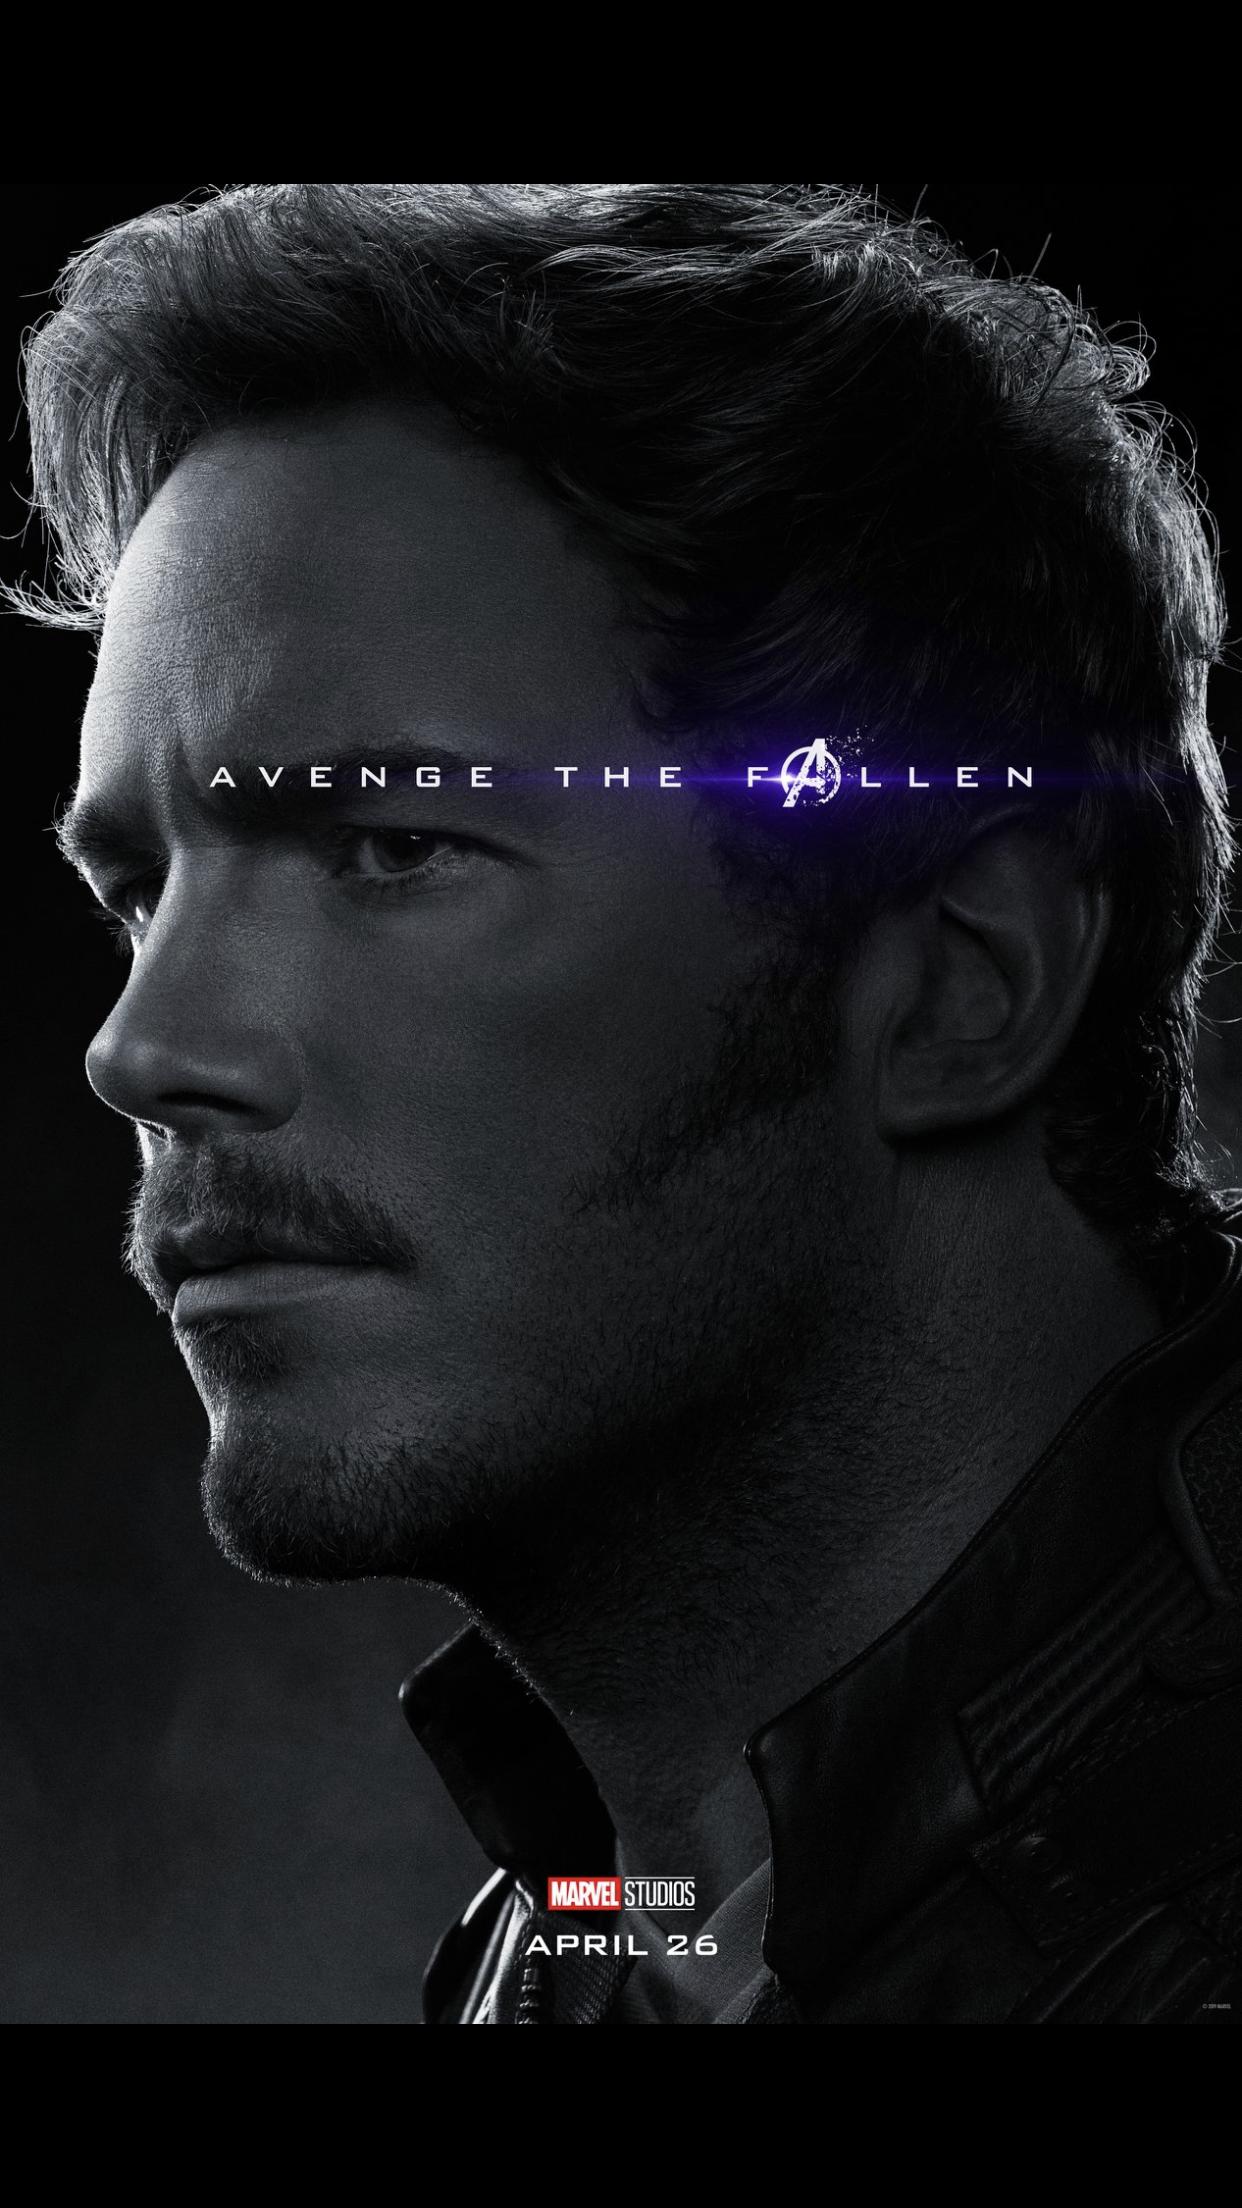 Starlord Avenge The Fallen Endgame Avengers Movies Marvel Entertainment Marvel Superheroes